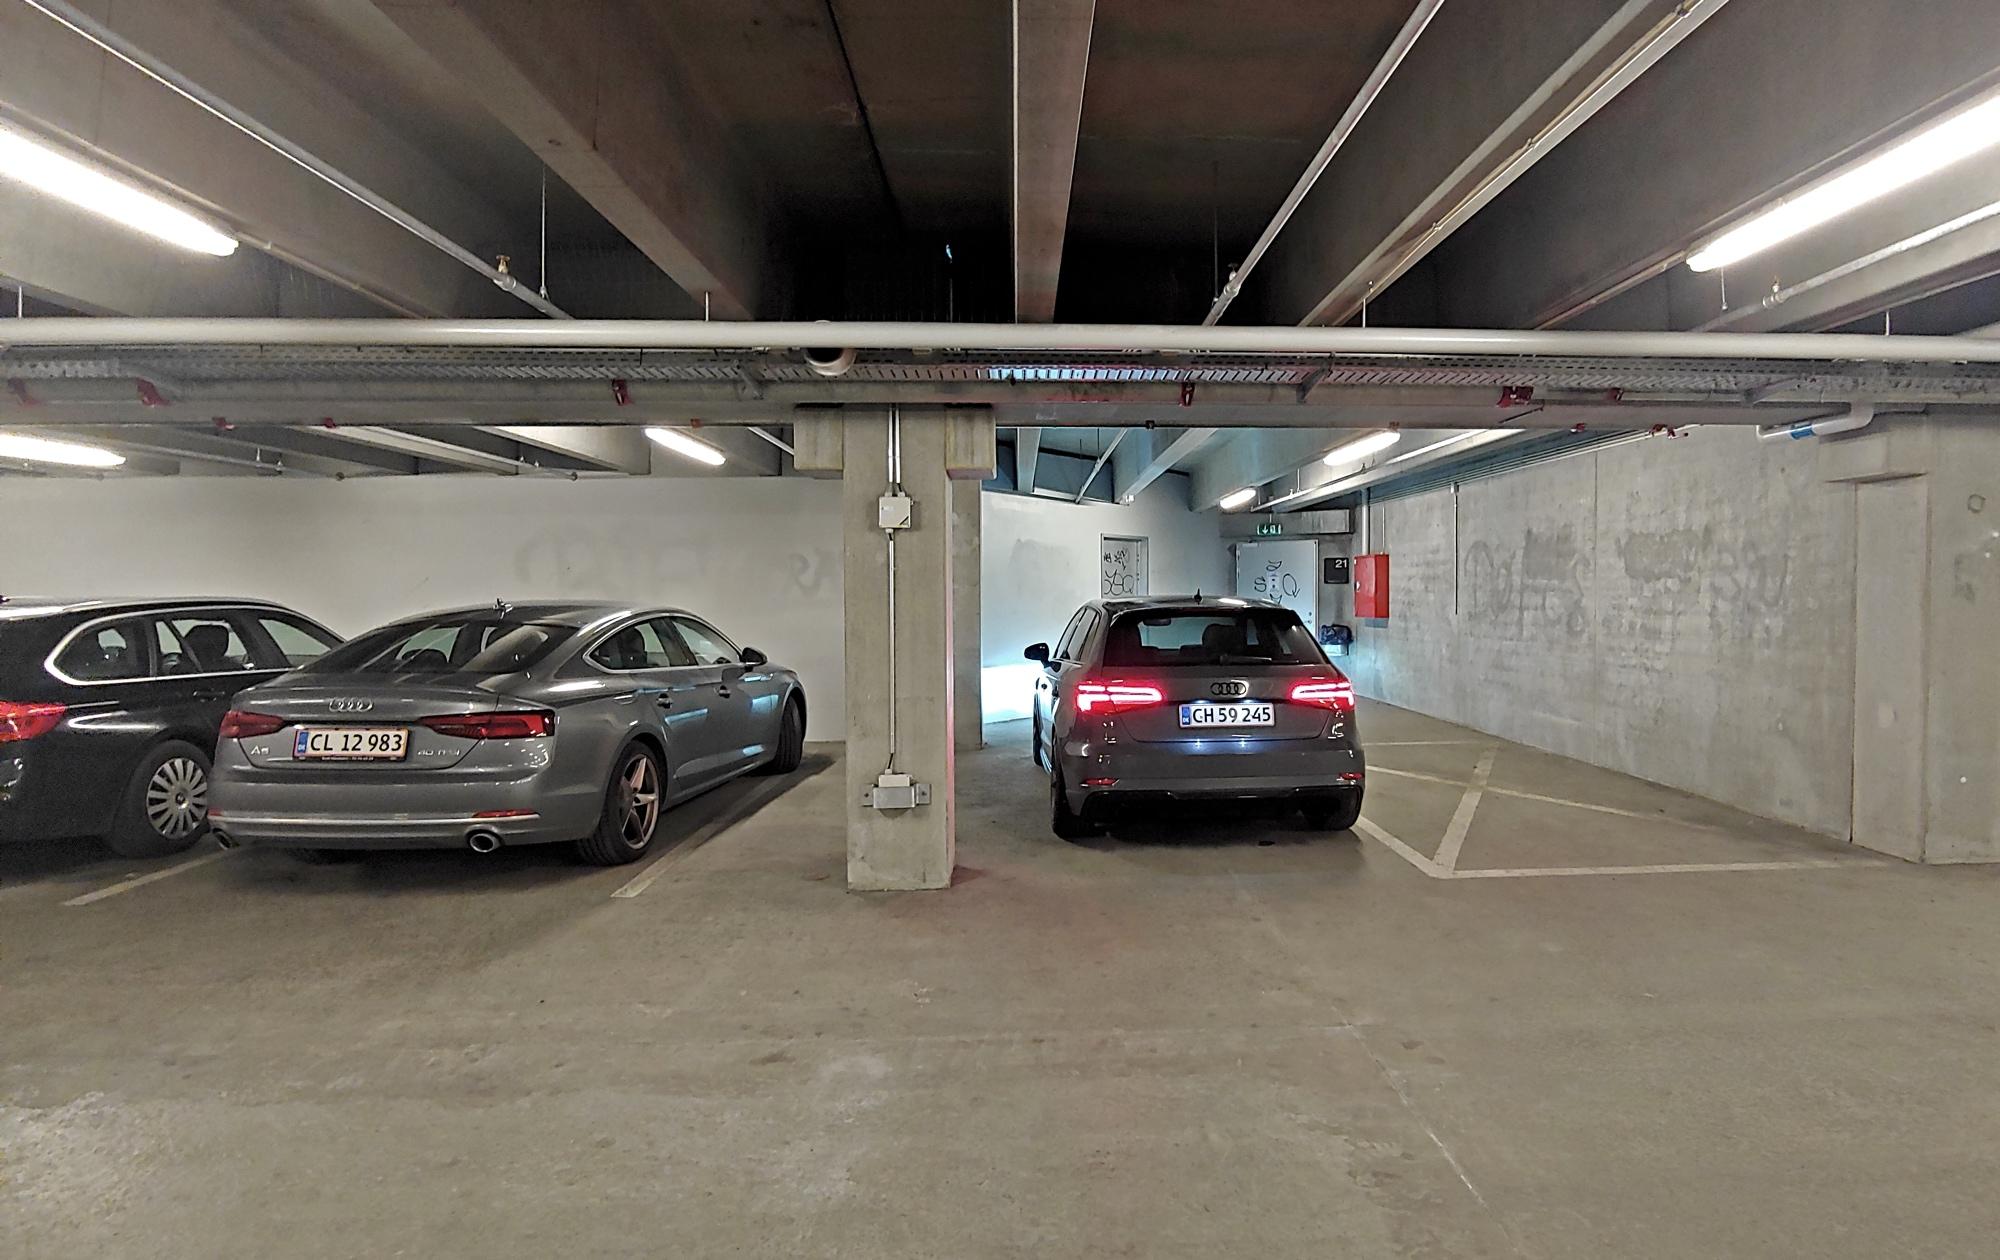 Extreme parking 5.jpg